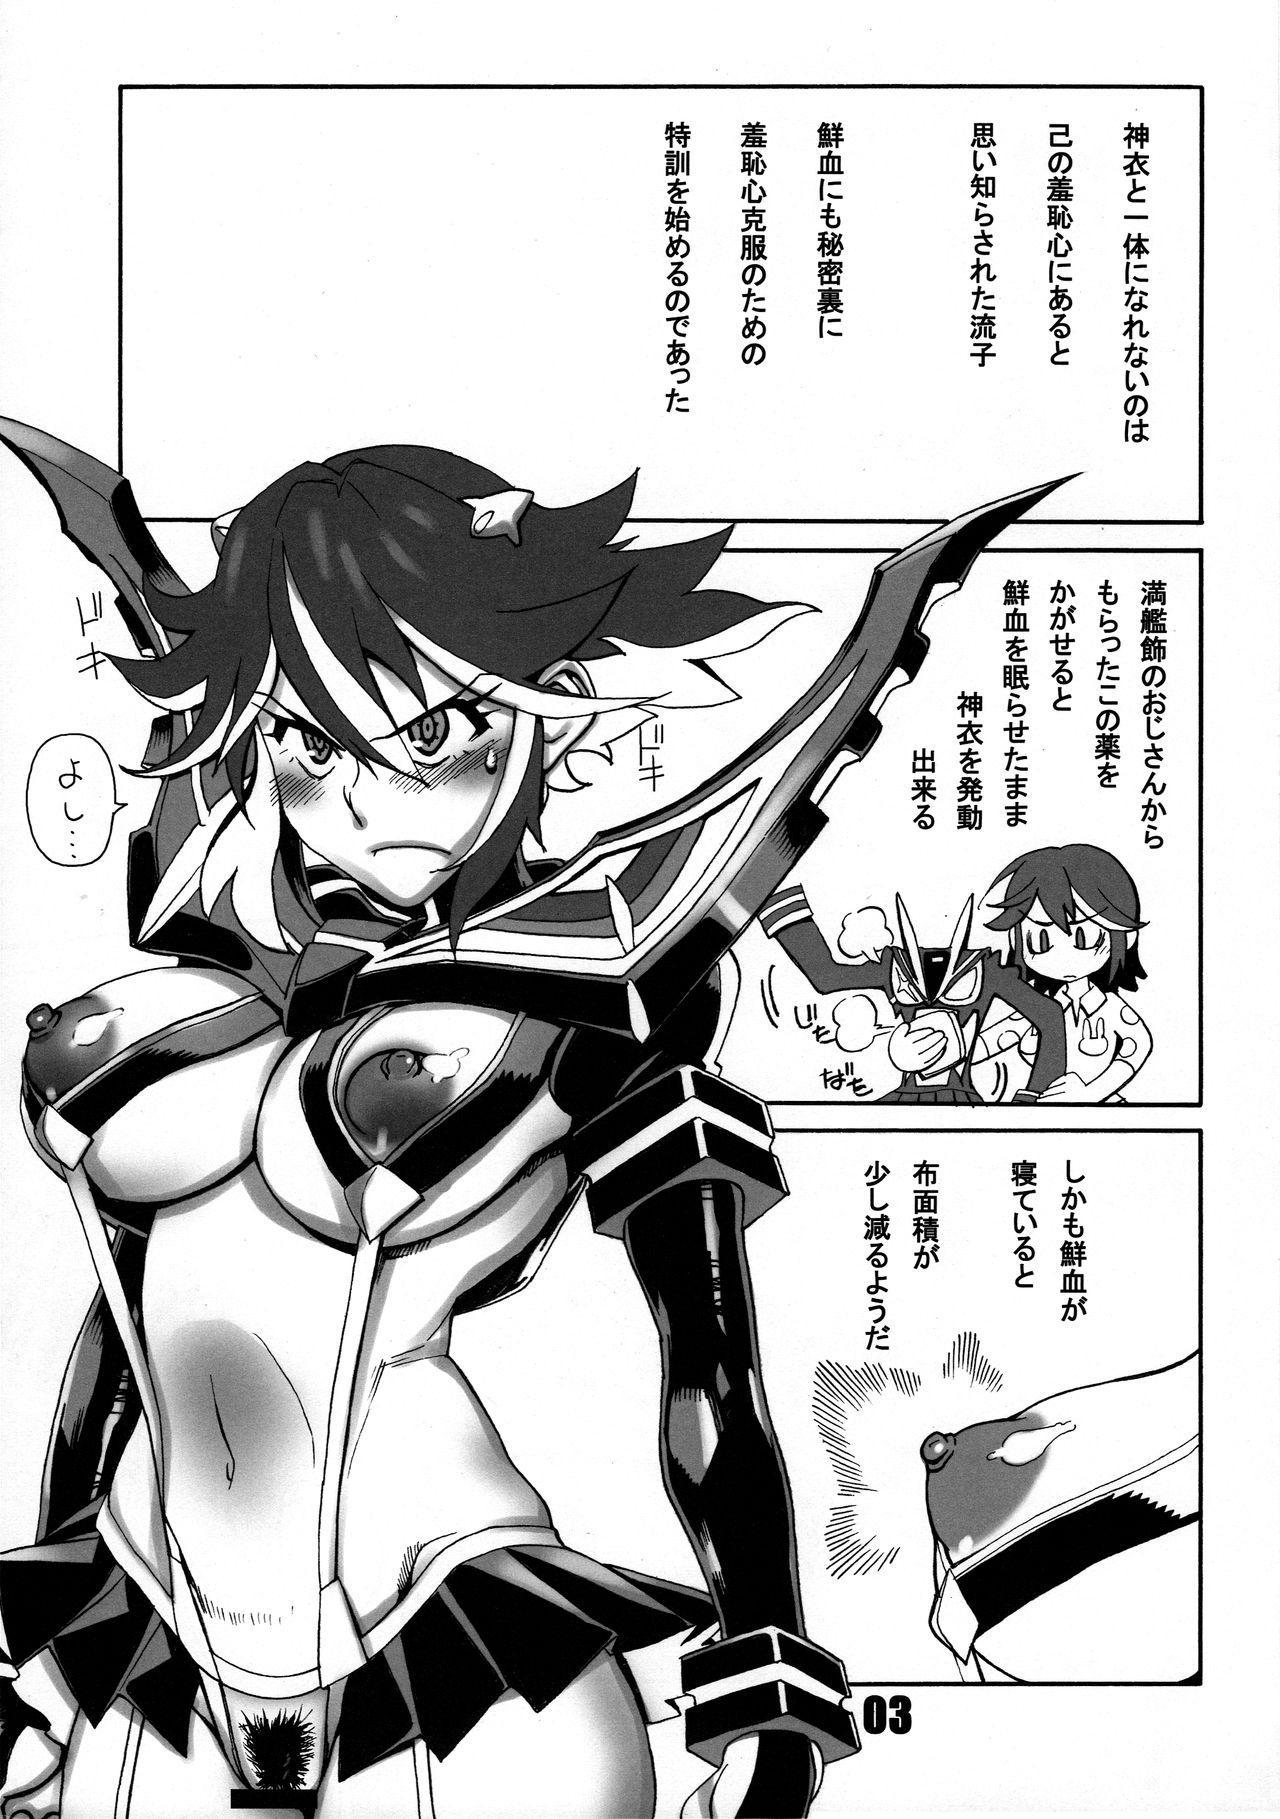 KILLlaKILL Daisanwa Made no Ryuuko ga Ichiban Kawaii 2